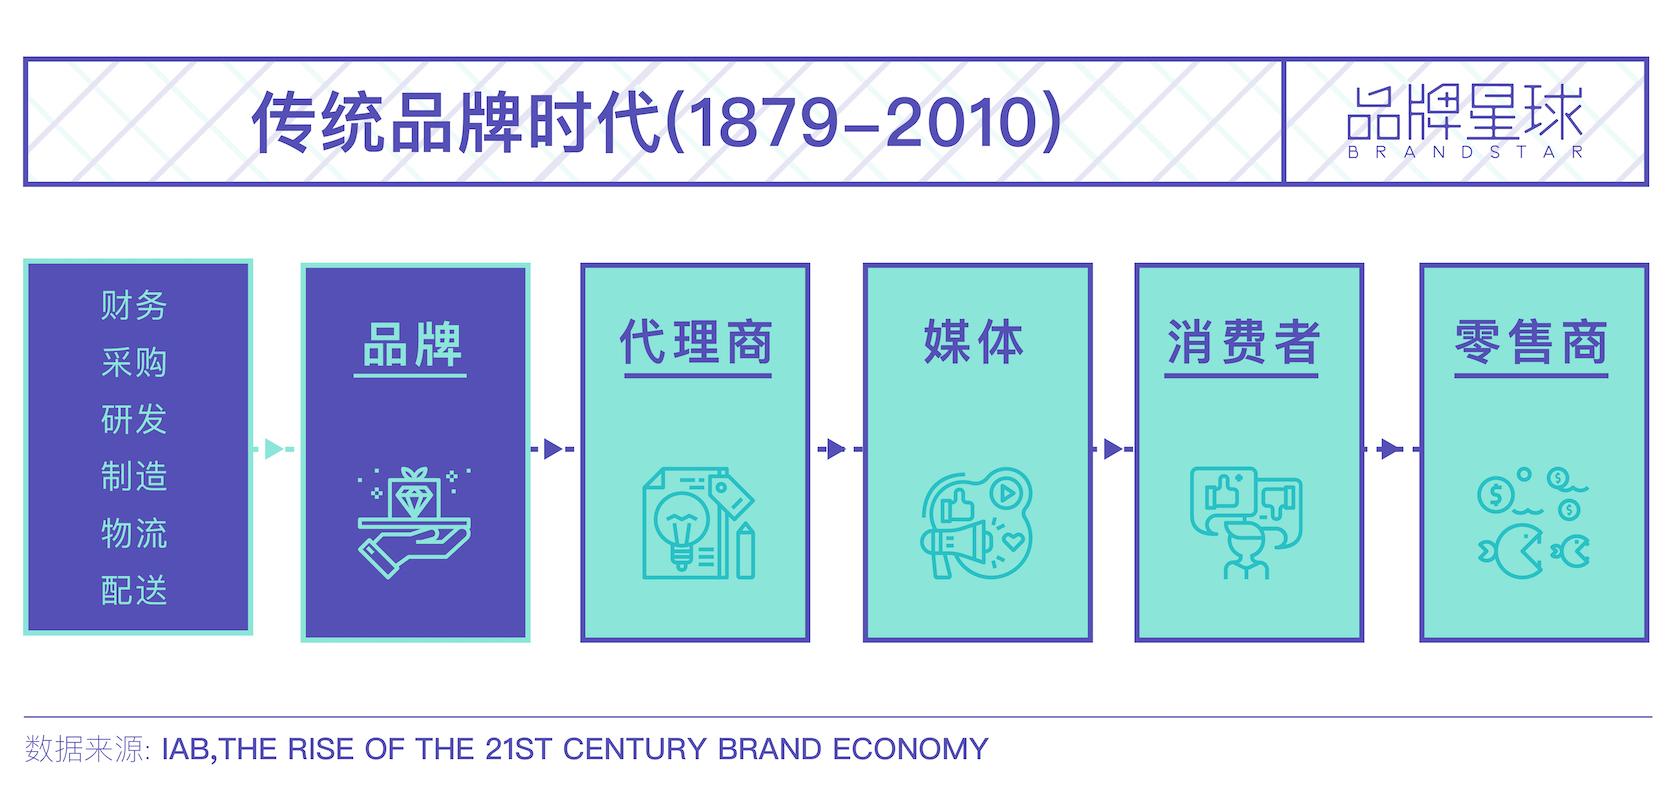 DTC 品牌-品牌星球-brandstar